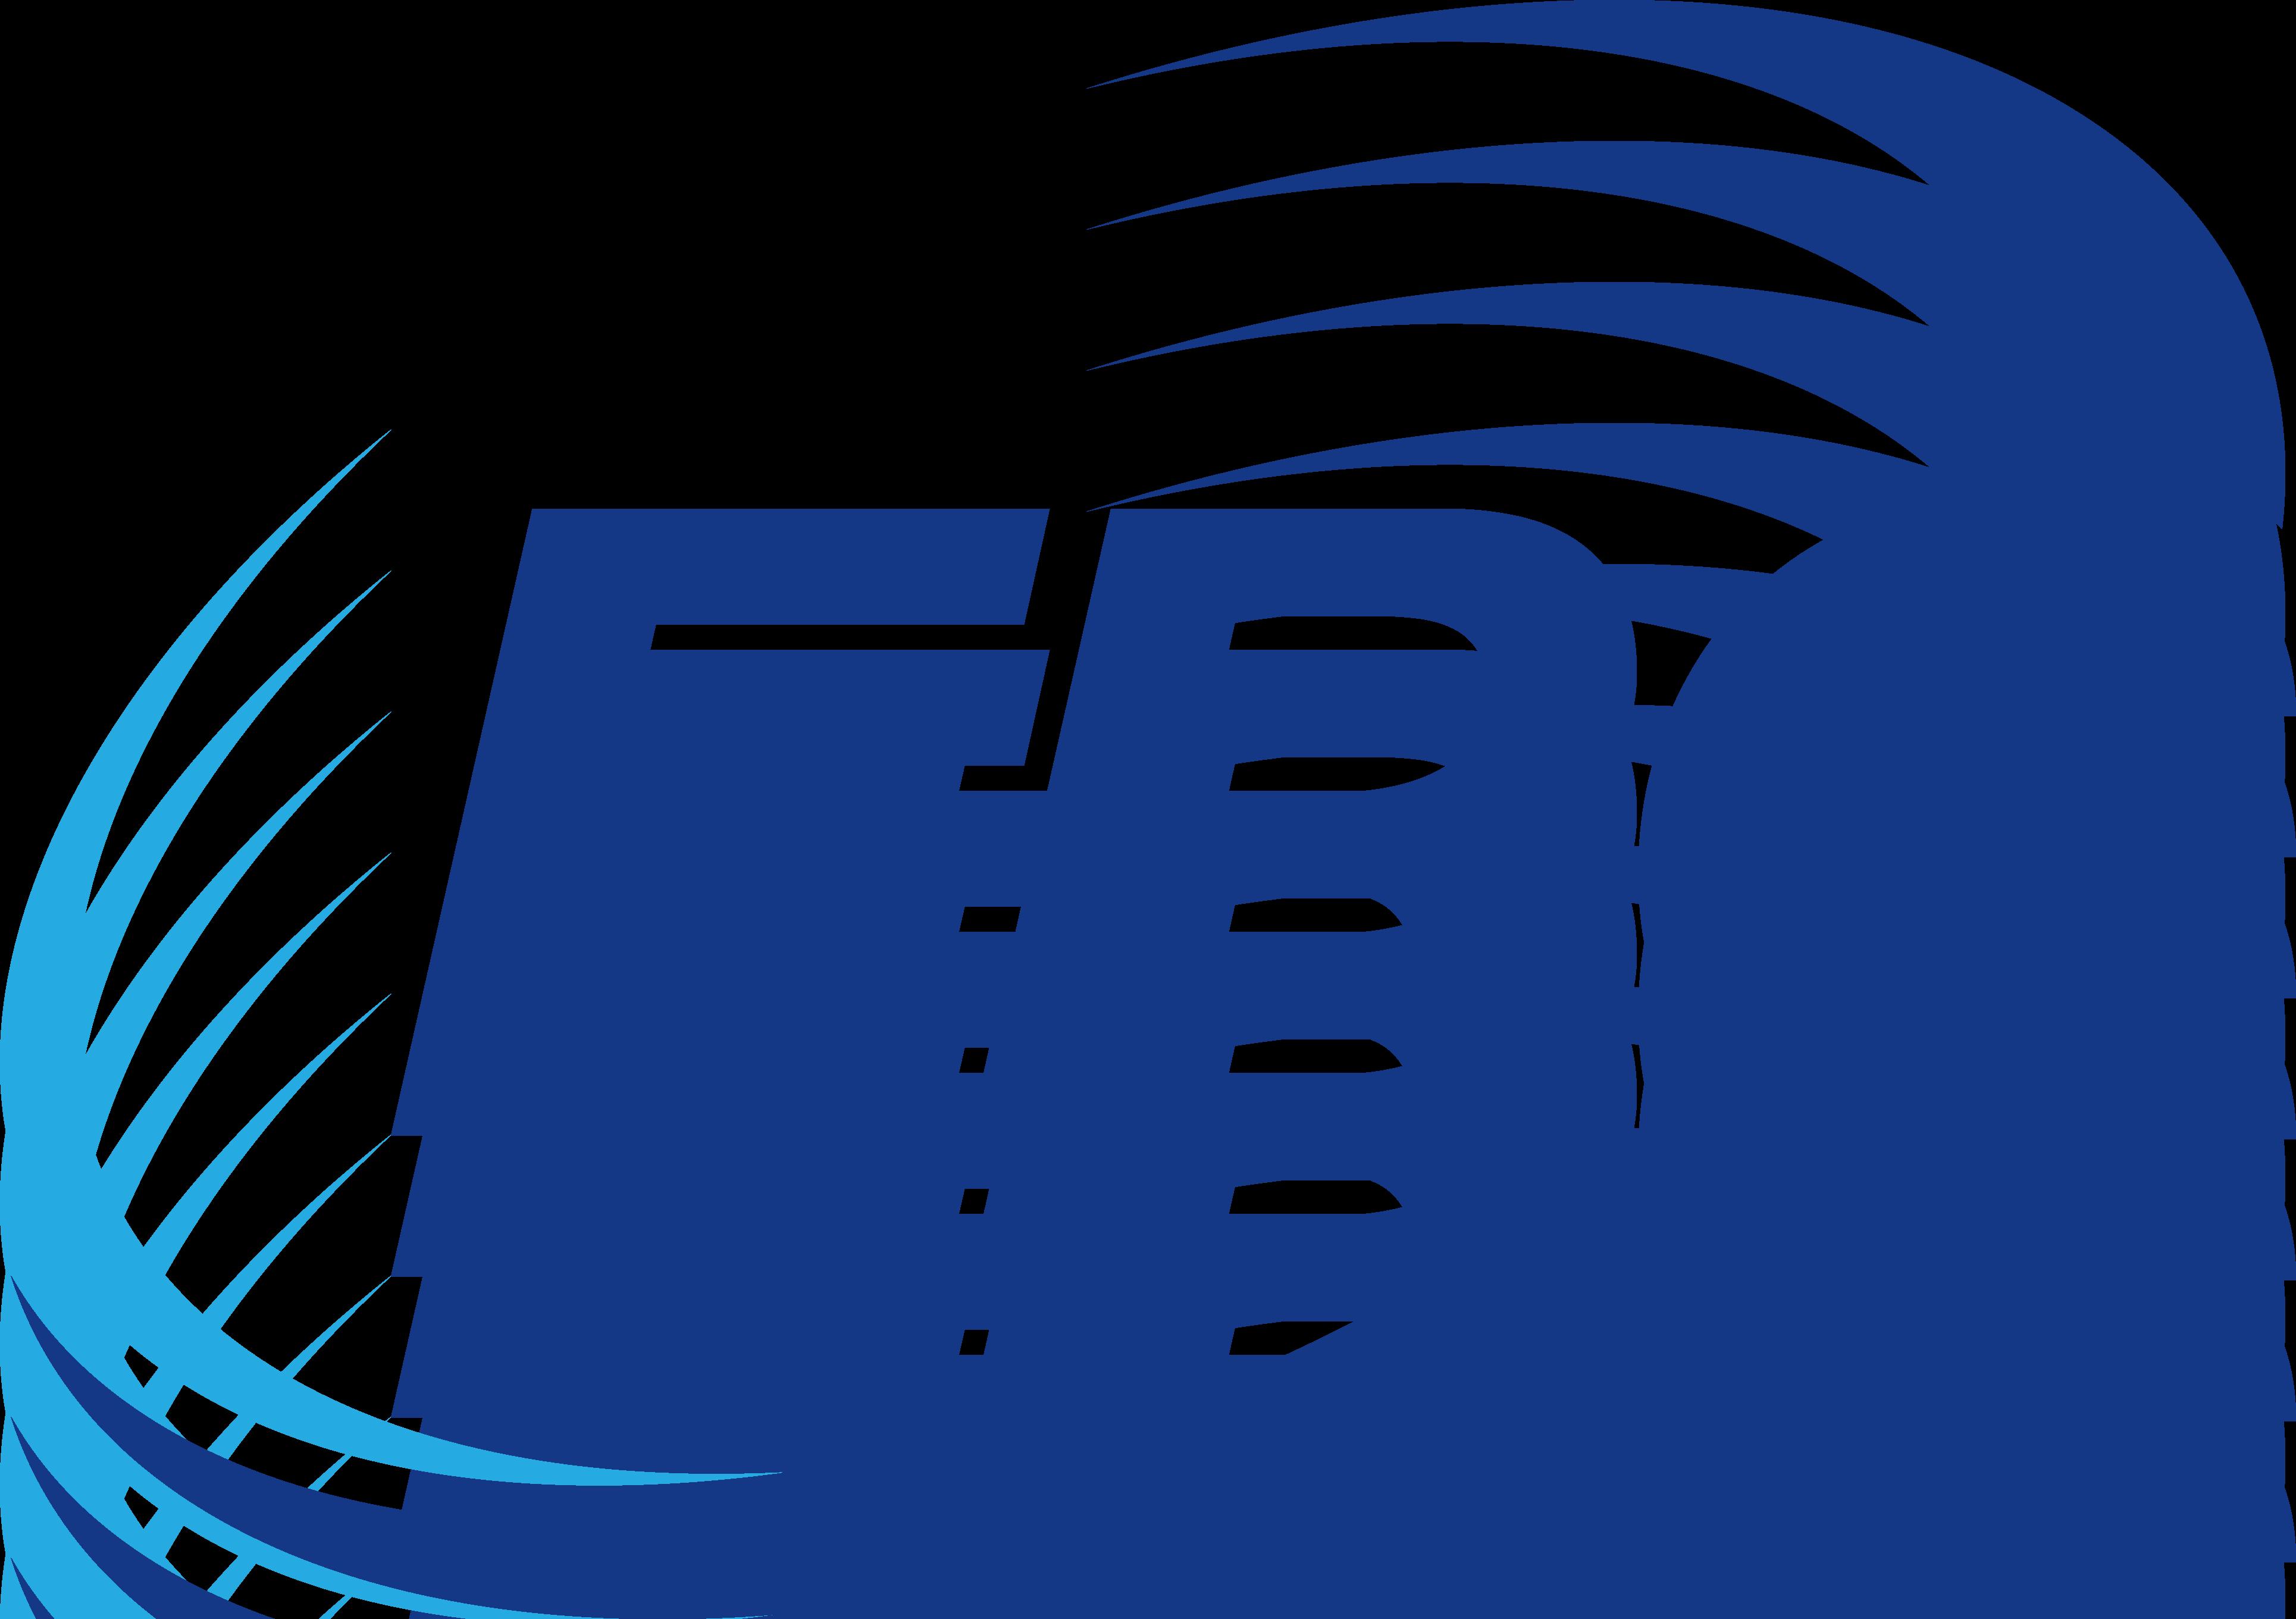 ERG, Inc. Becomes an Opencompany on Glassdoor®